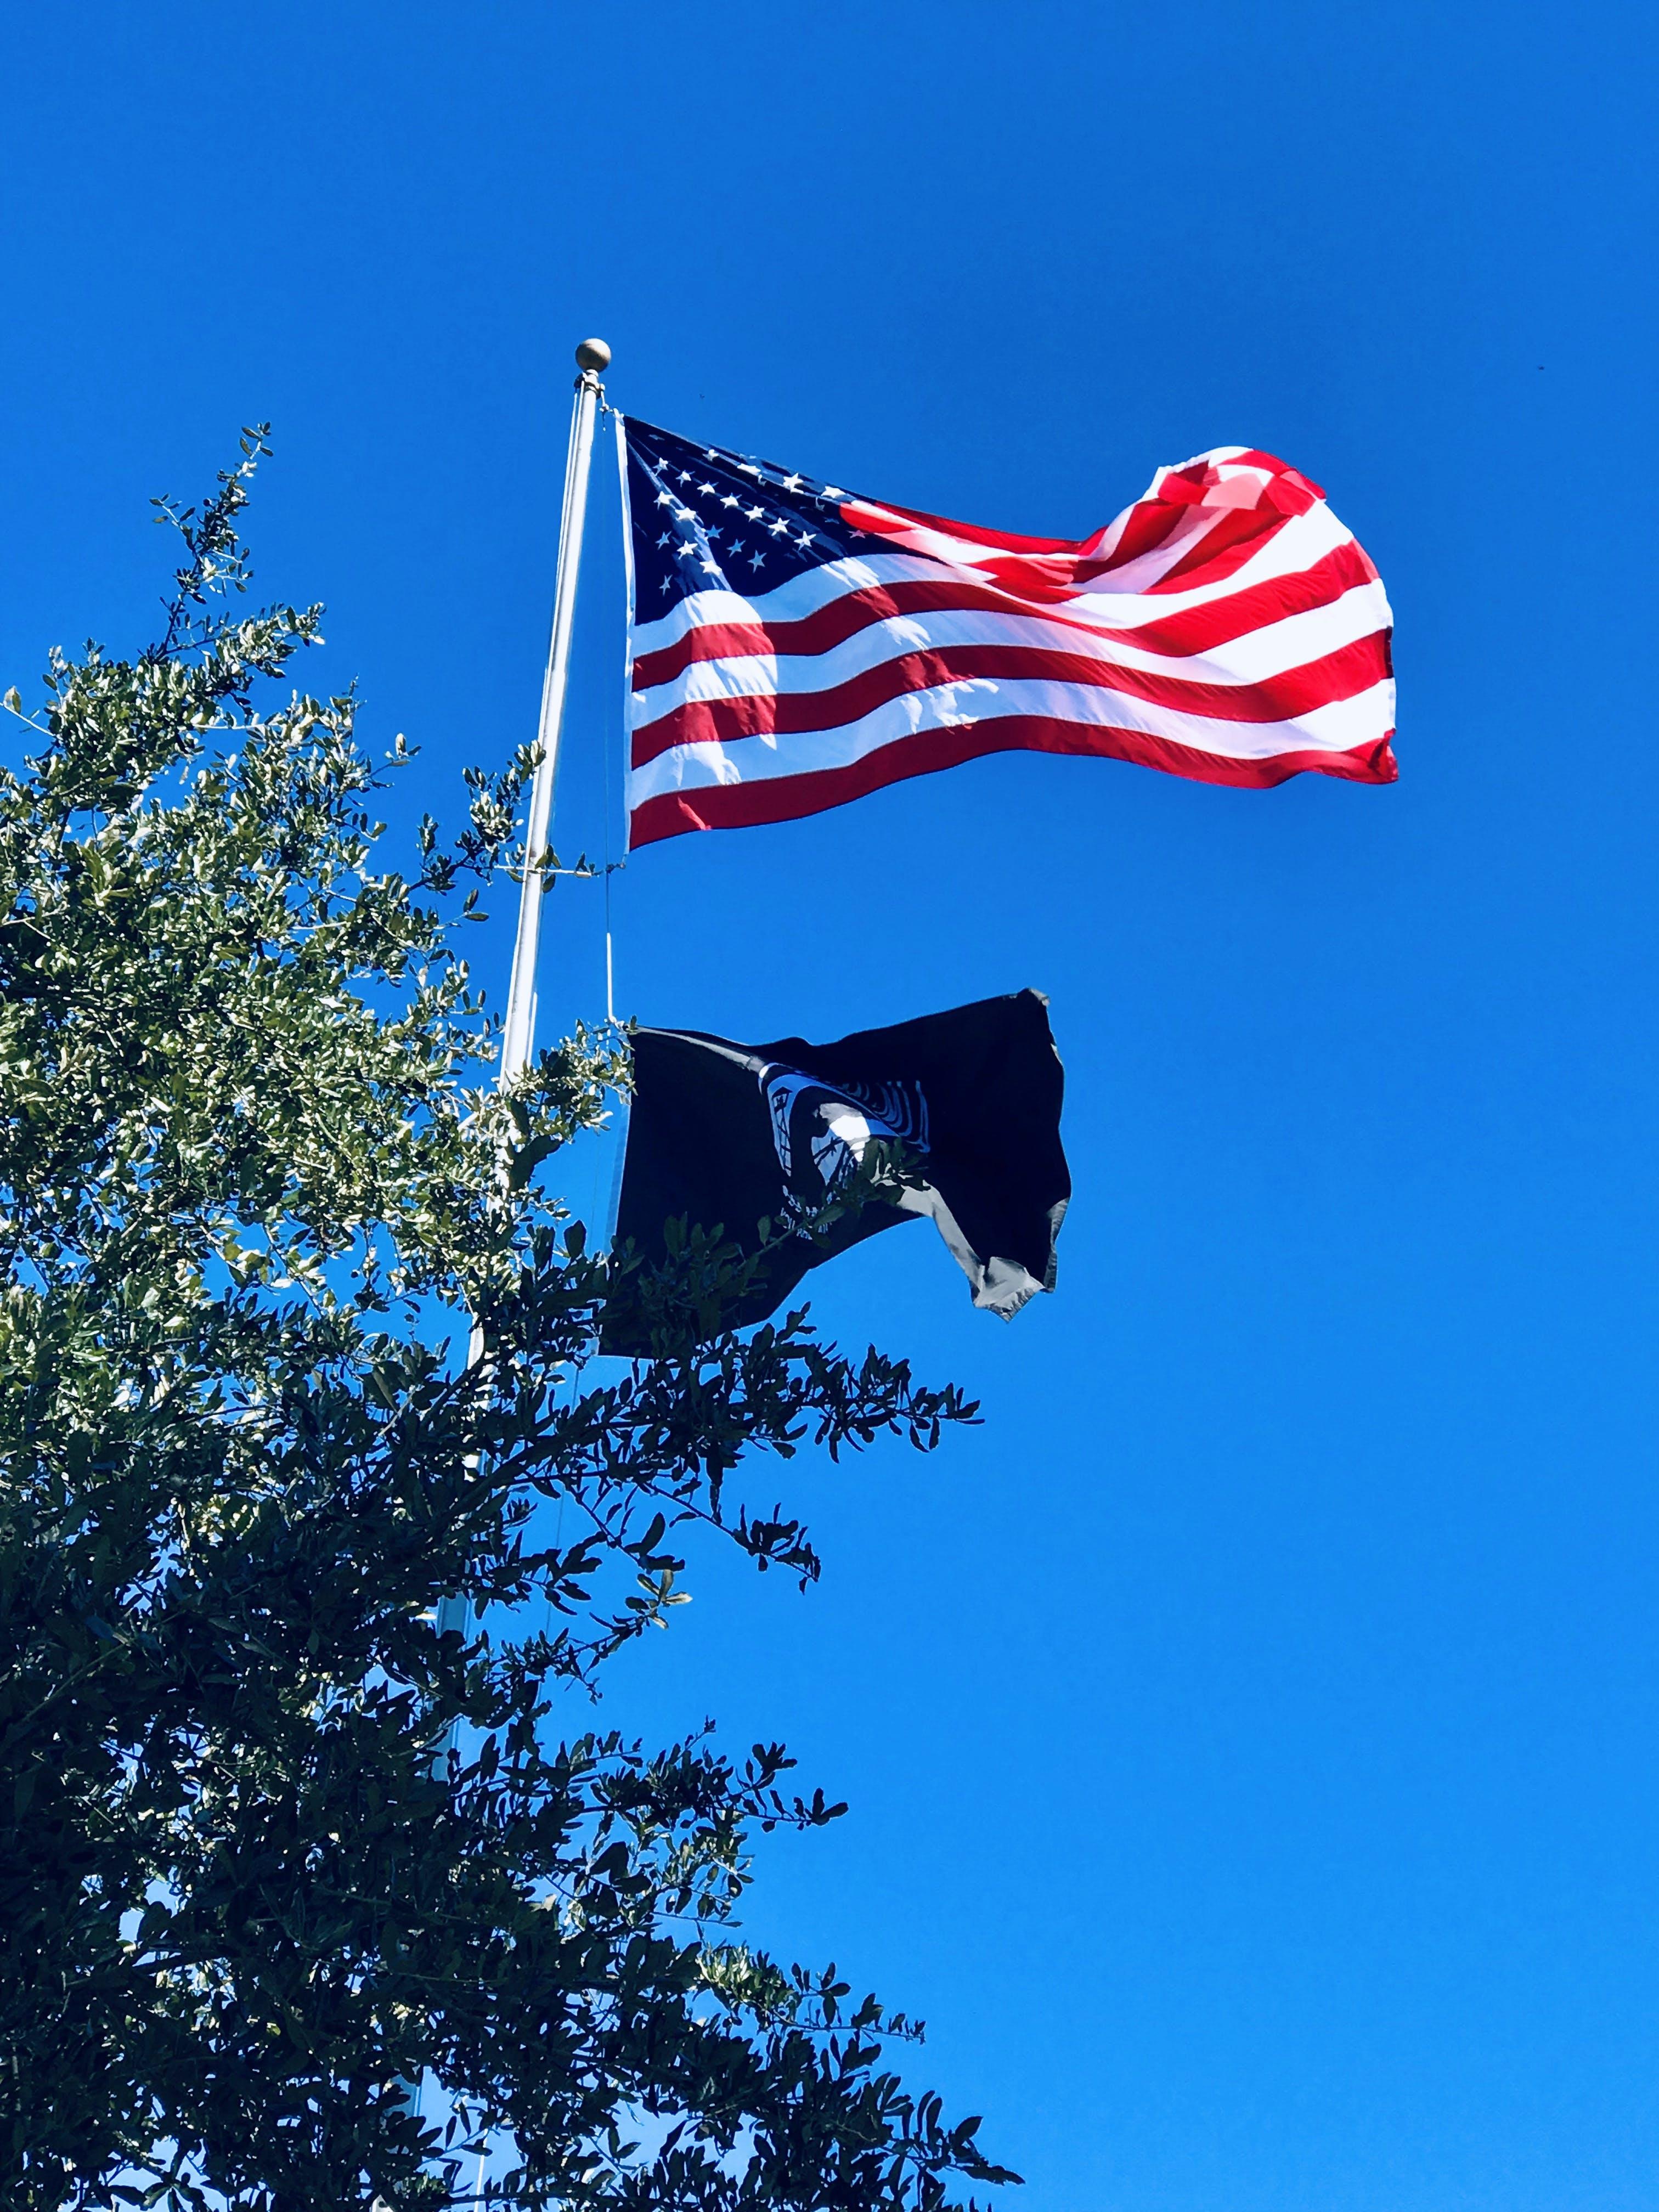 Free stock photo of american, American flag, patriotic, POW flag